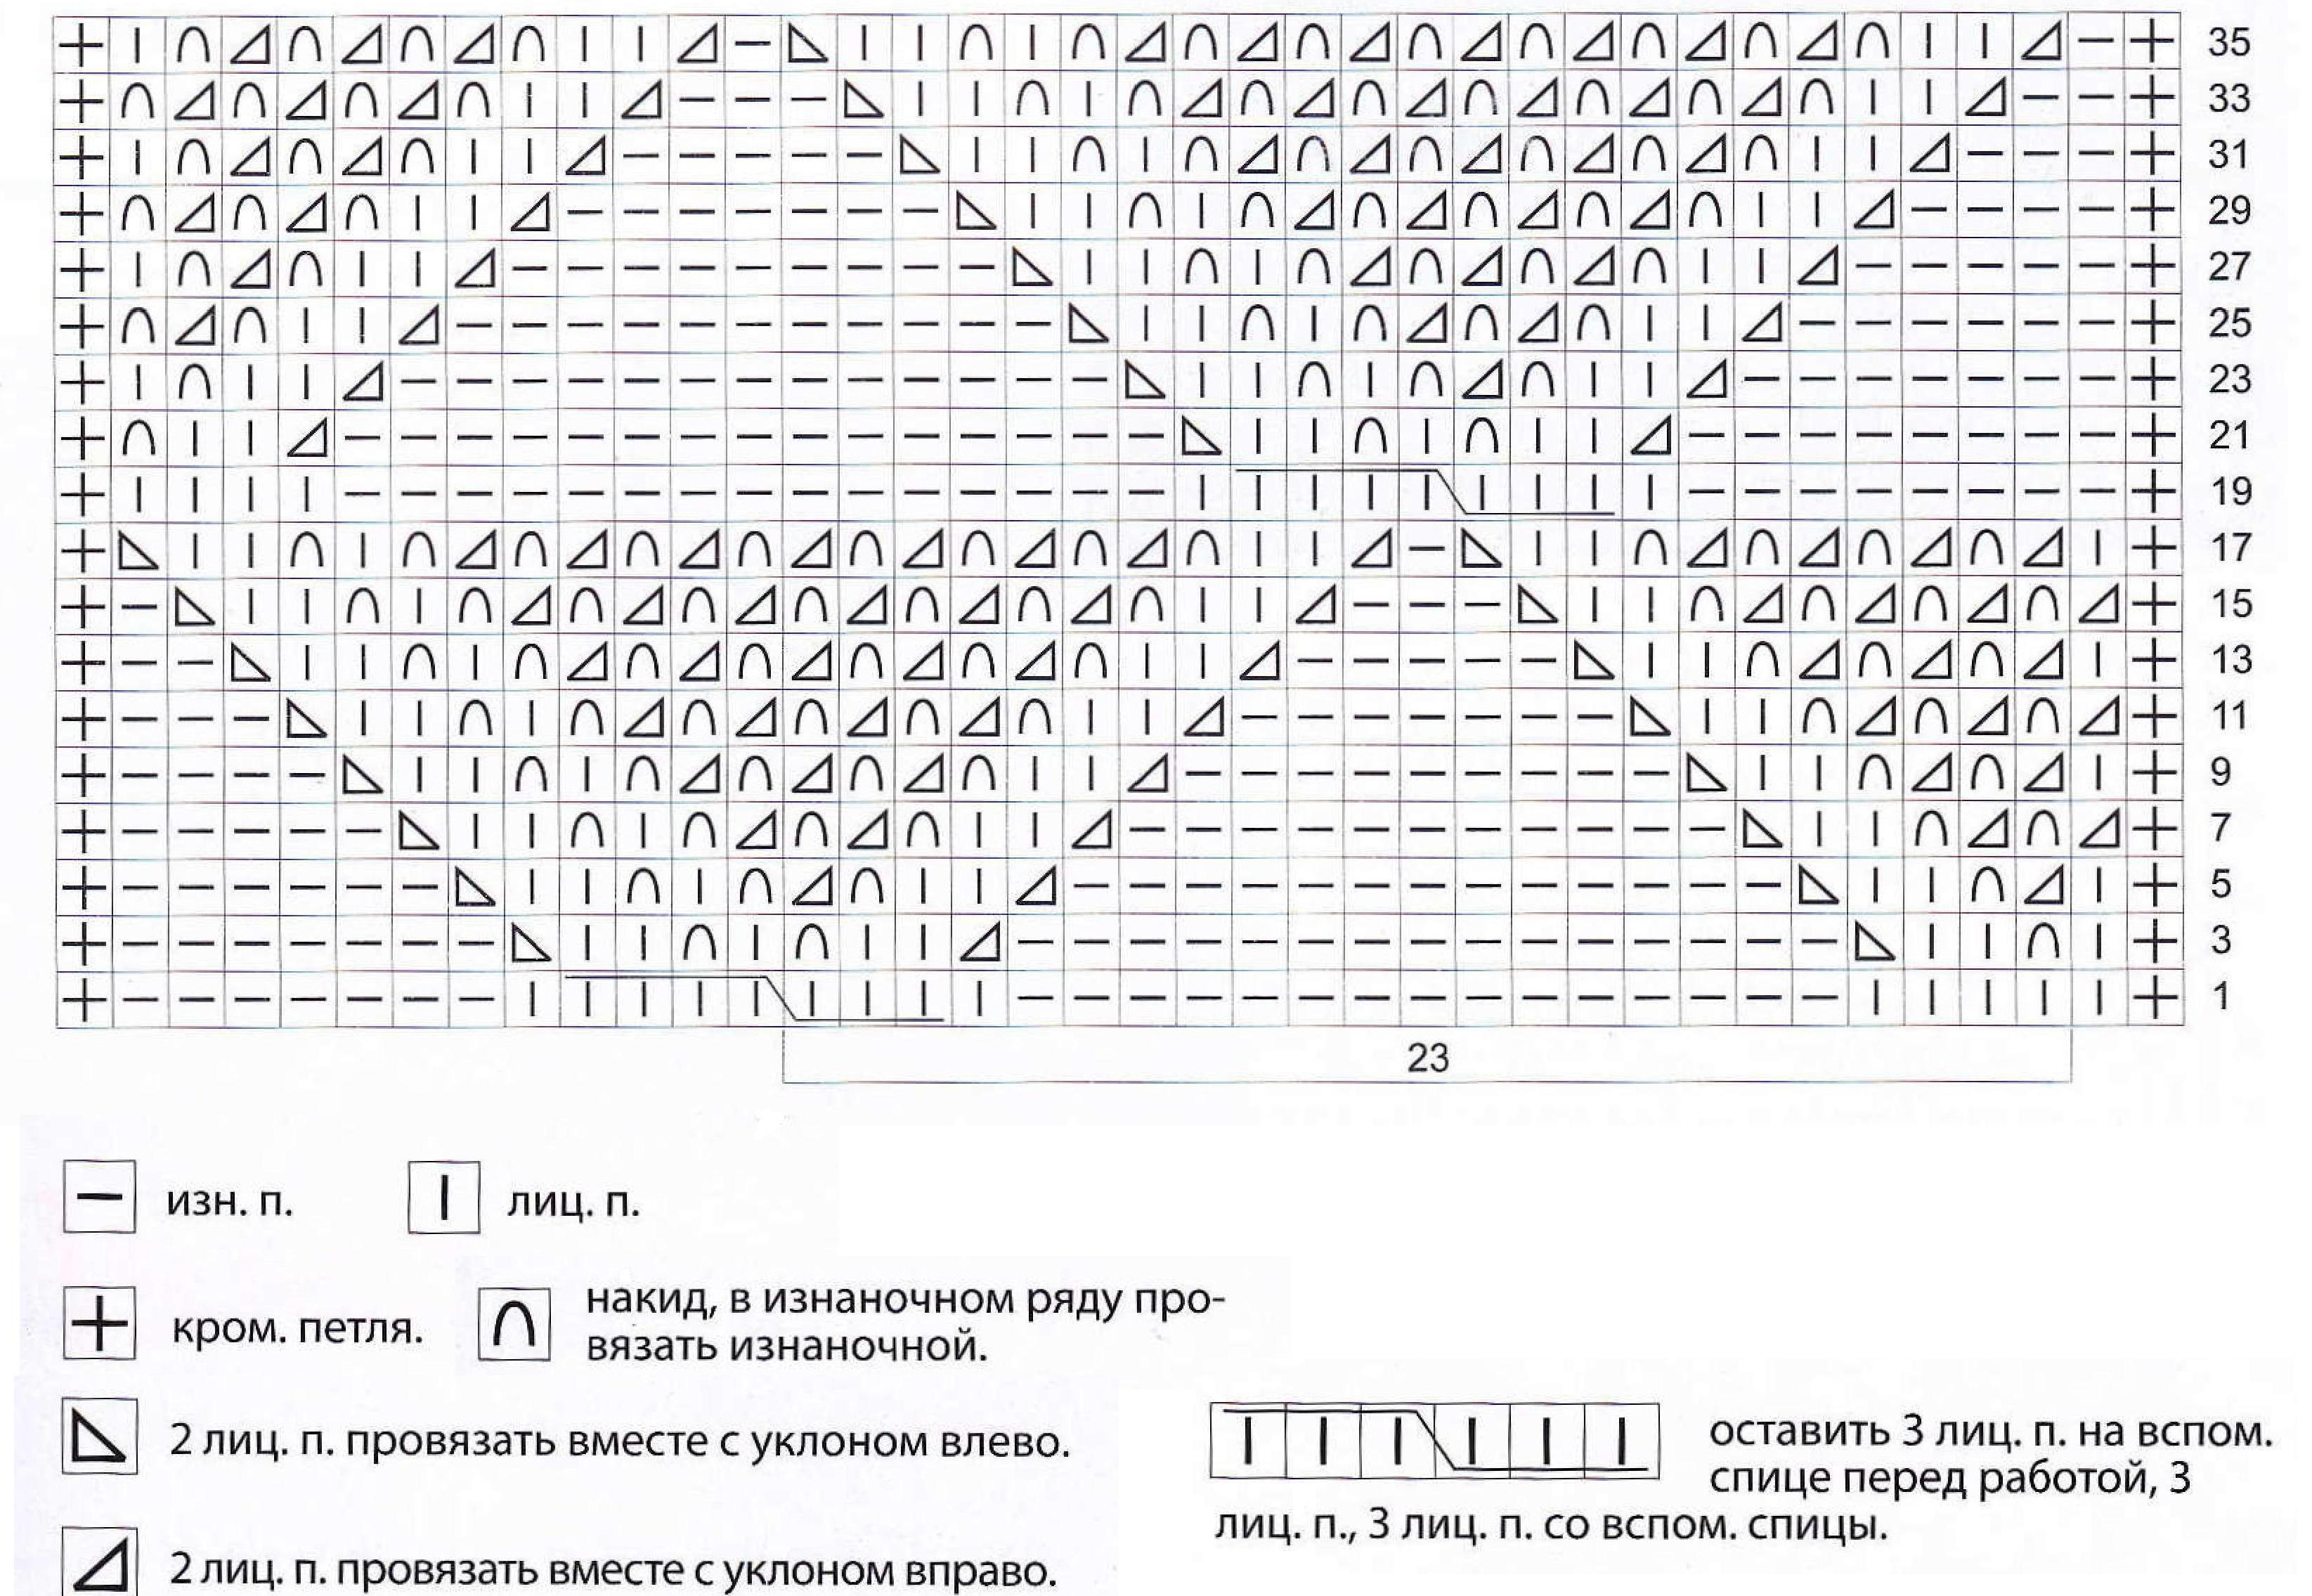 Узор спицами с геометрическими элементами схема